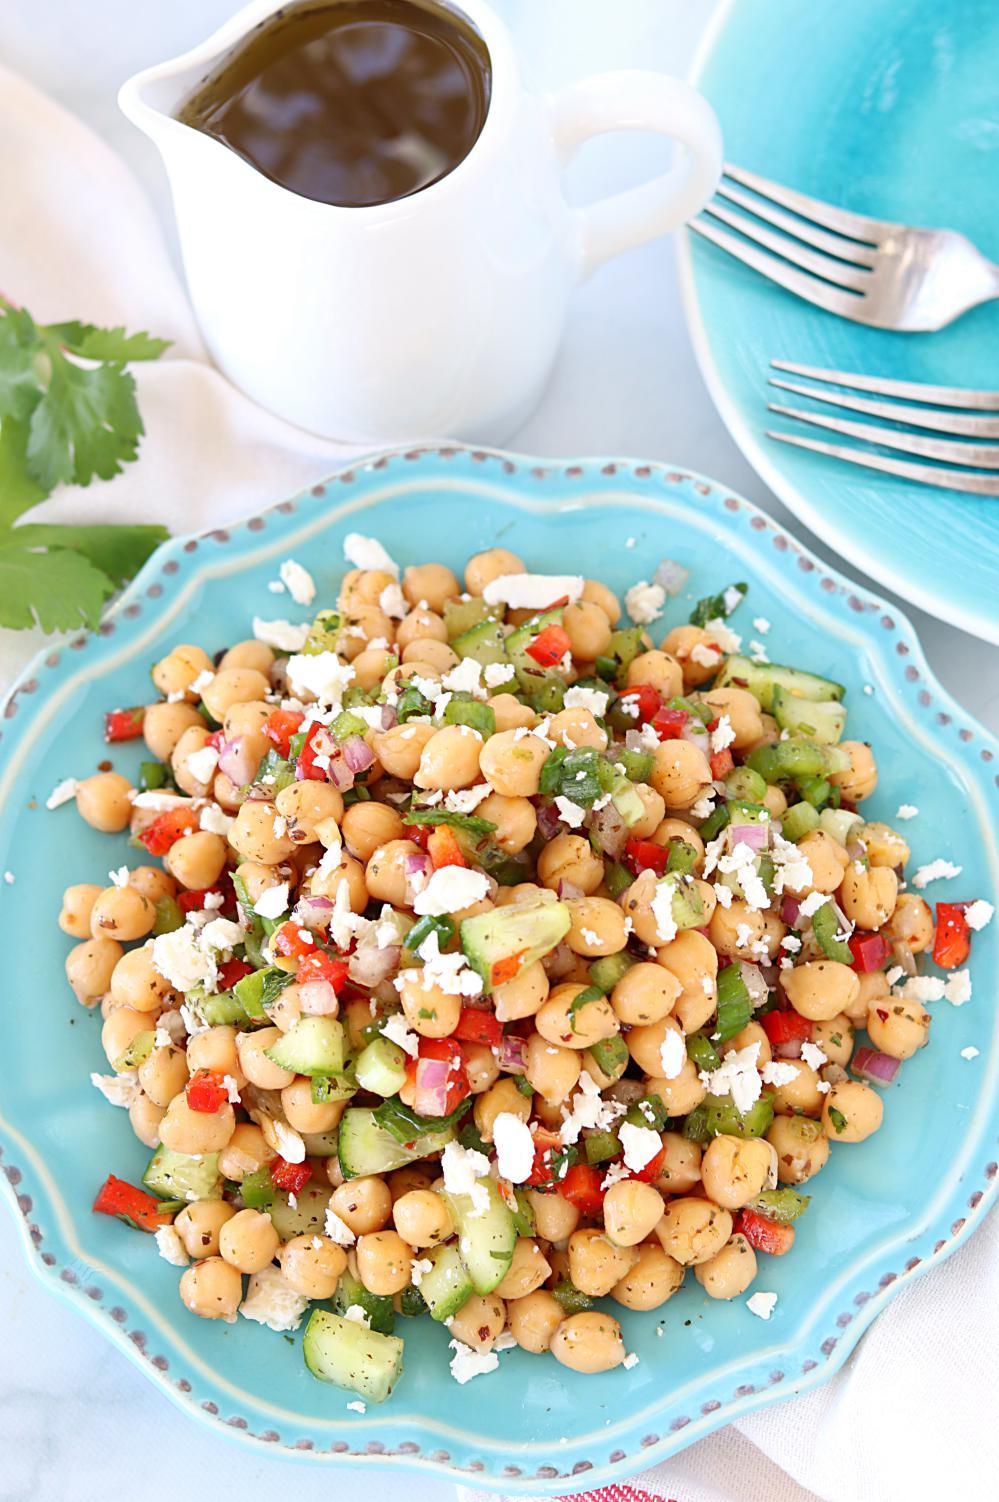 No cook chickpea salad